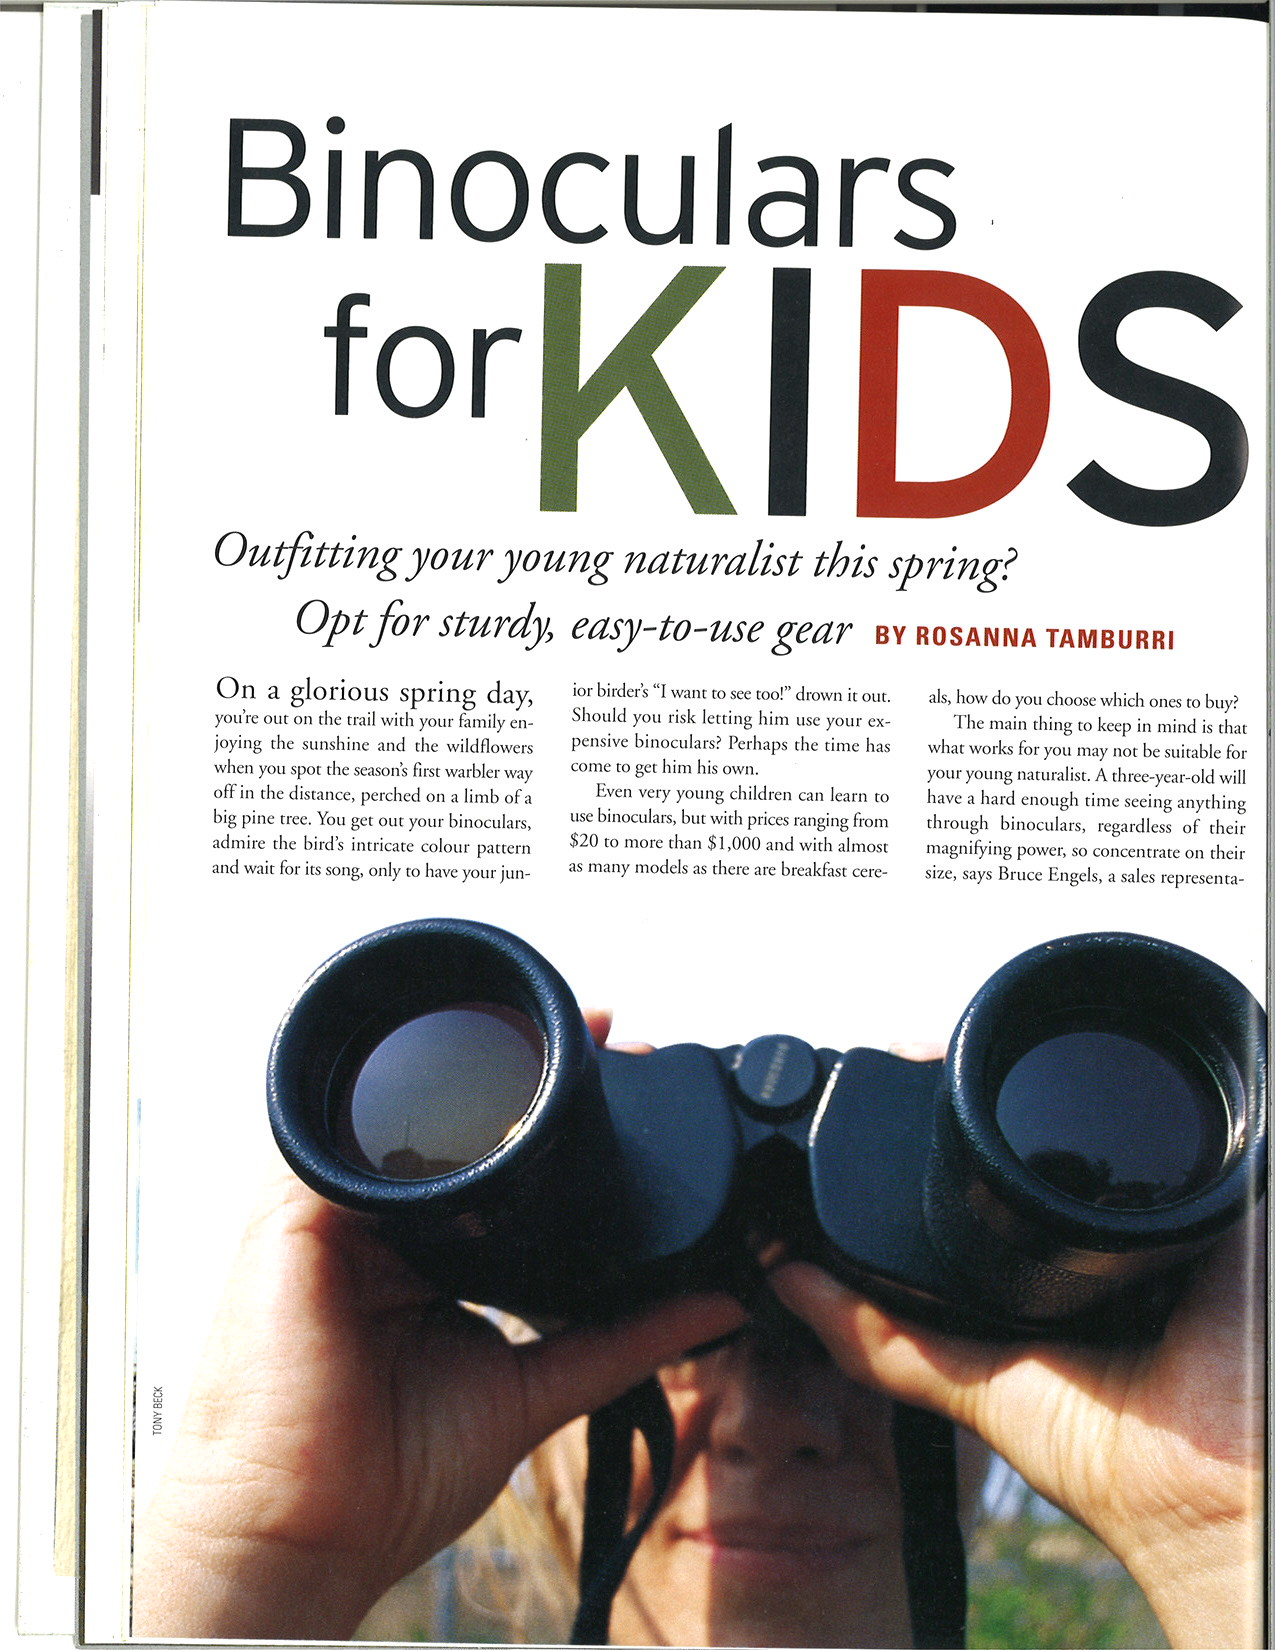 seasons_2003_v43_i1_f_Binoculars_for_kids_24